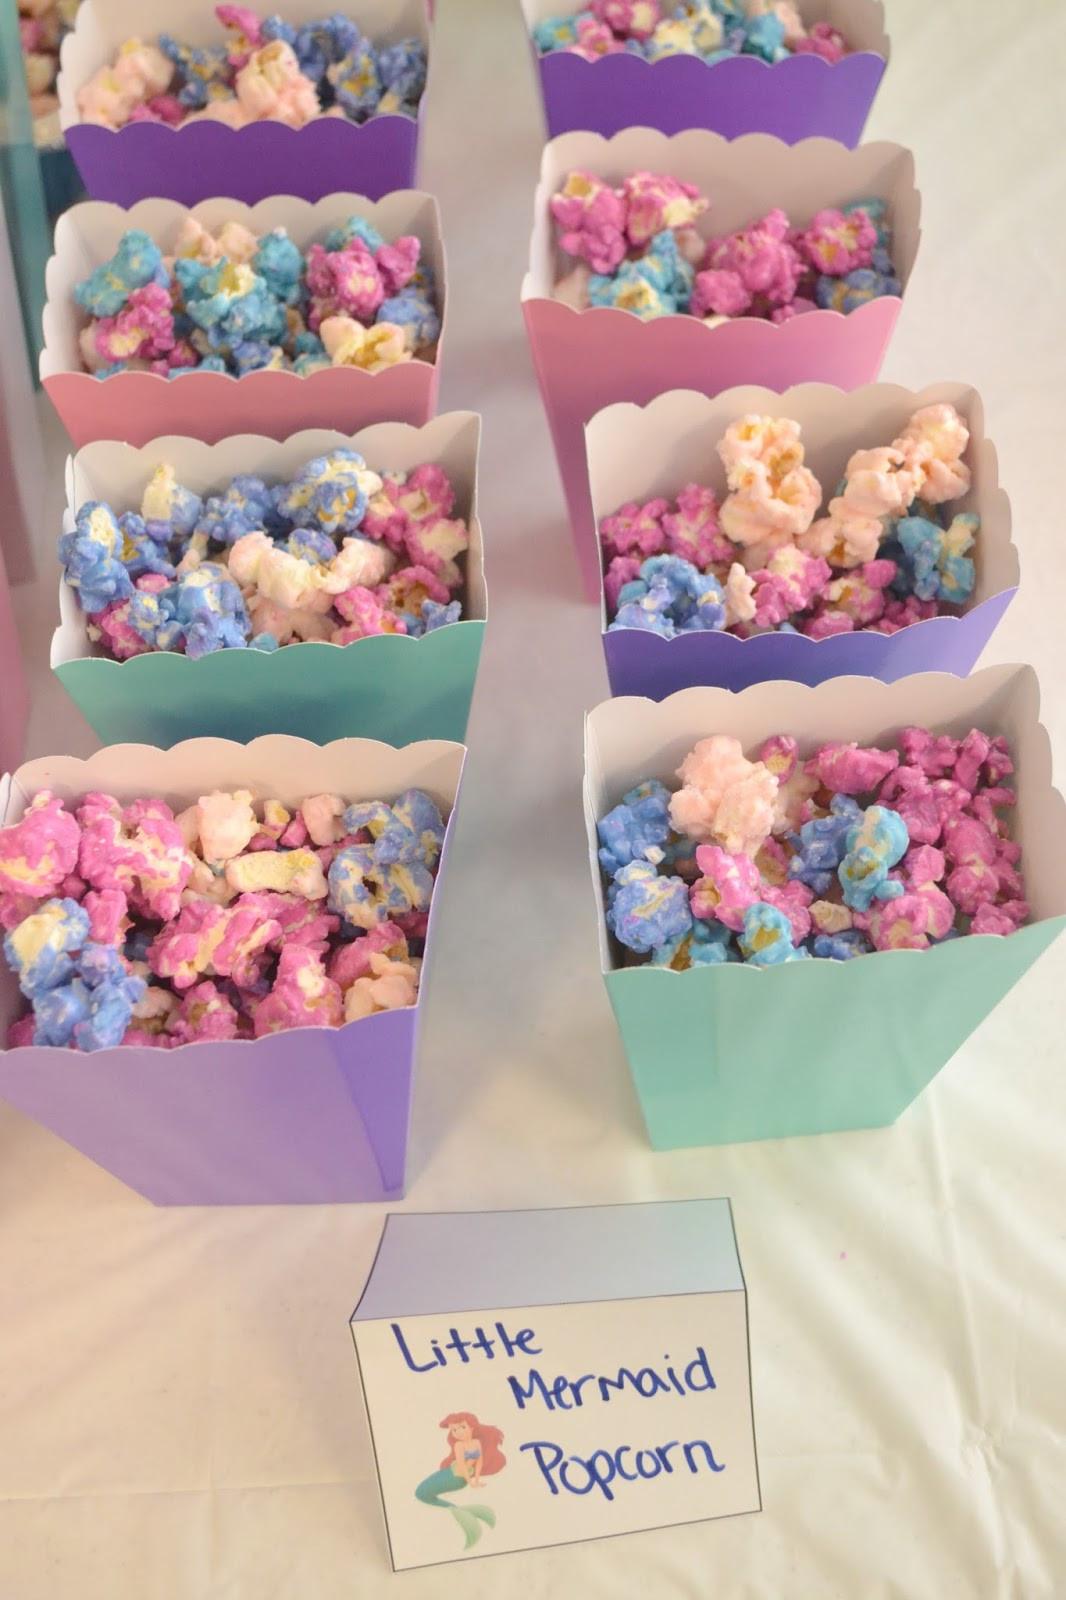 Ideas For Little Mermaid Birthday Party  Little Mermaid Birthday Party